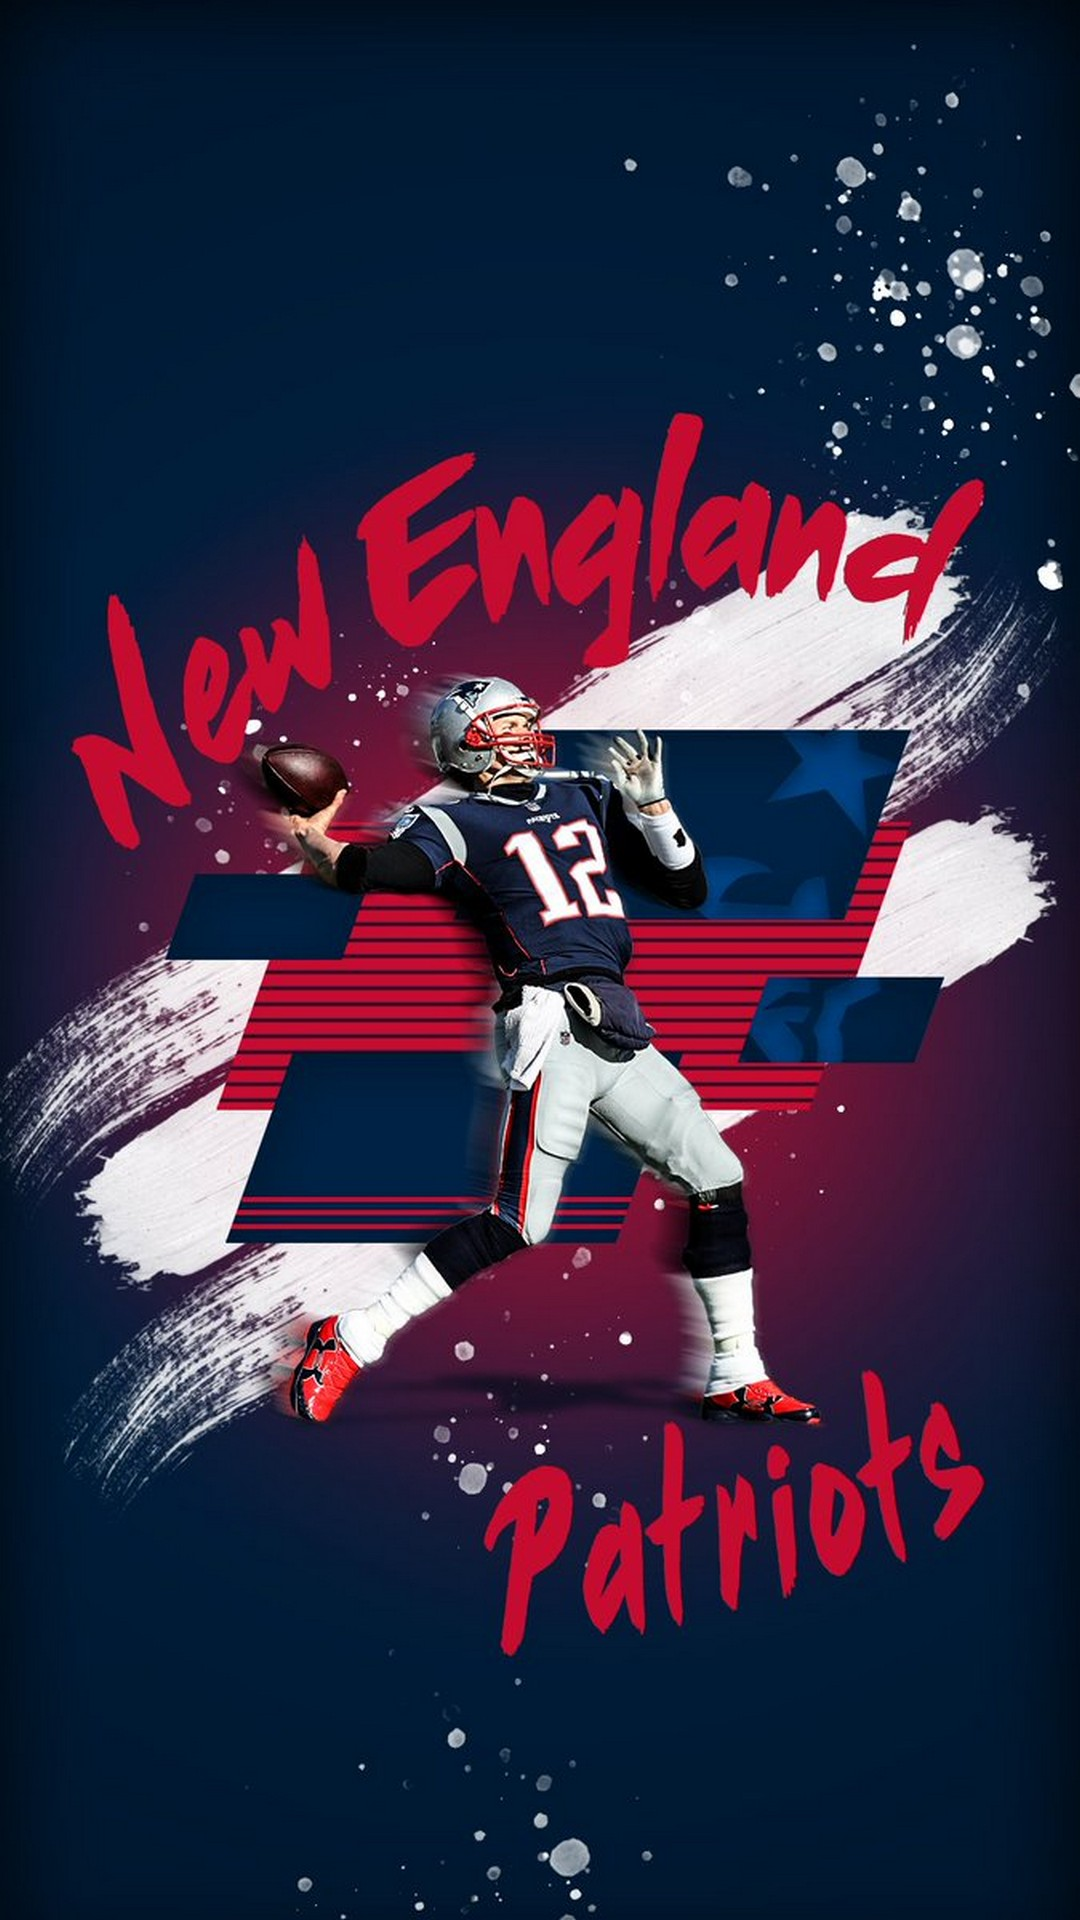 Tom Brady Patriots iPhone 7 Wallpaper 2020 NFL Football Wallpapers 1080x1920